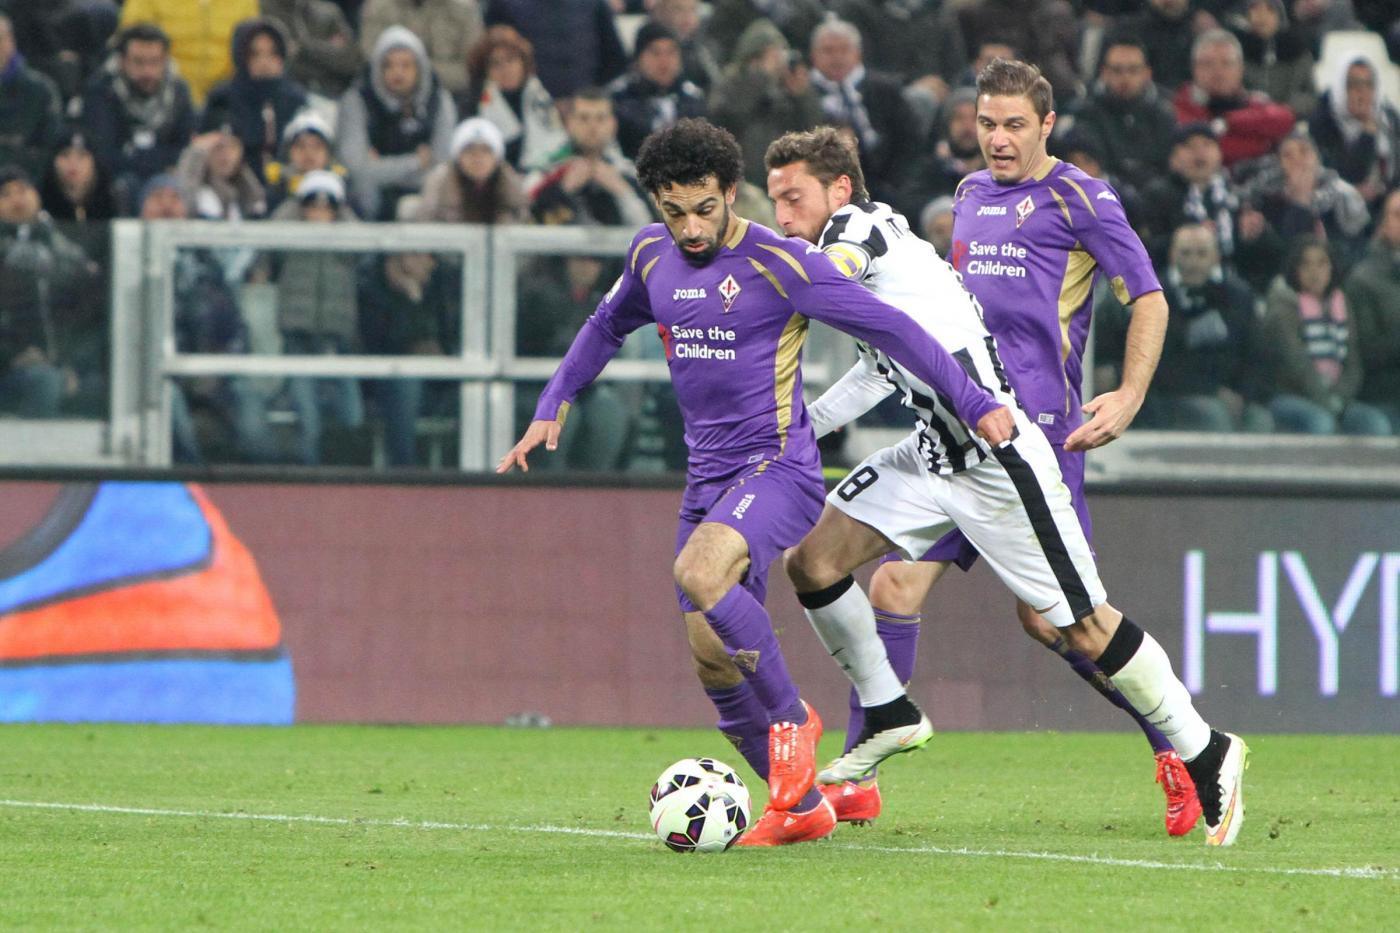 Coppa Italia, Fiorentina vs Juventus 0-3: ribaltone, bianconeri in finale